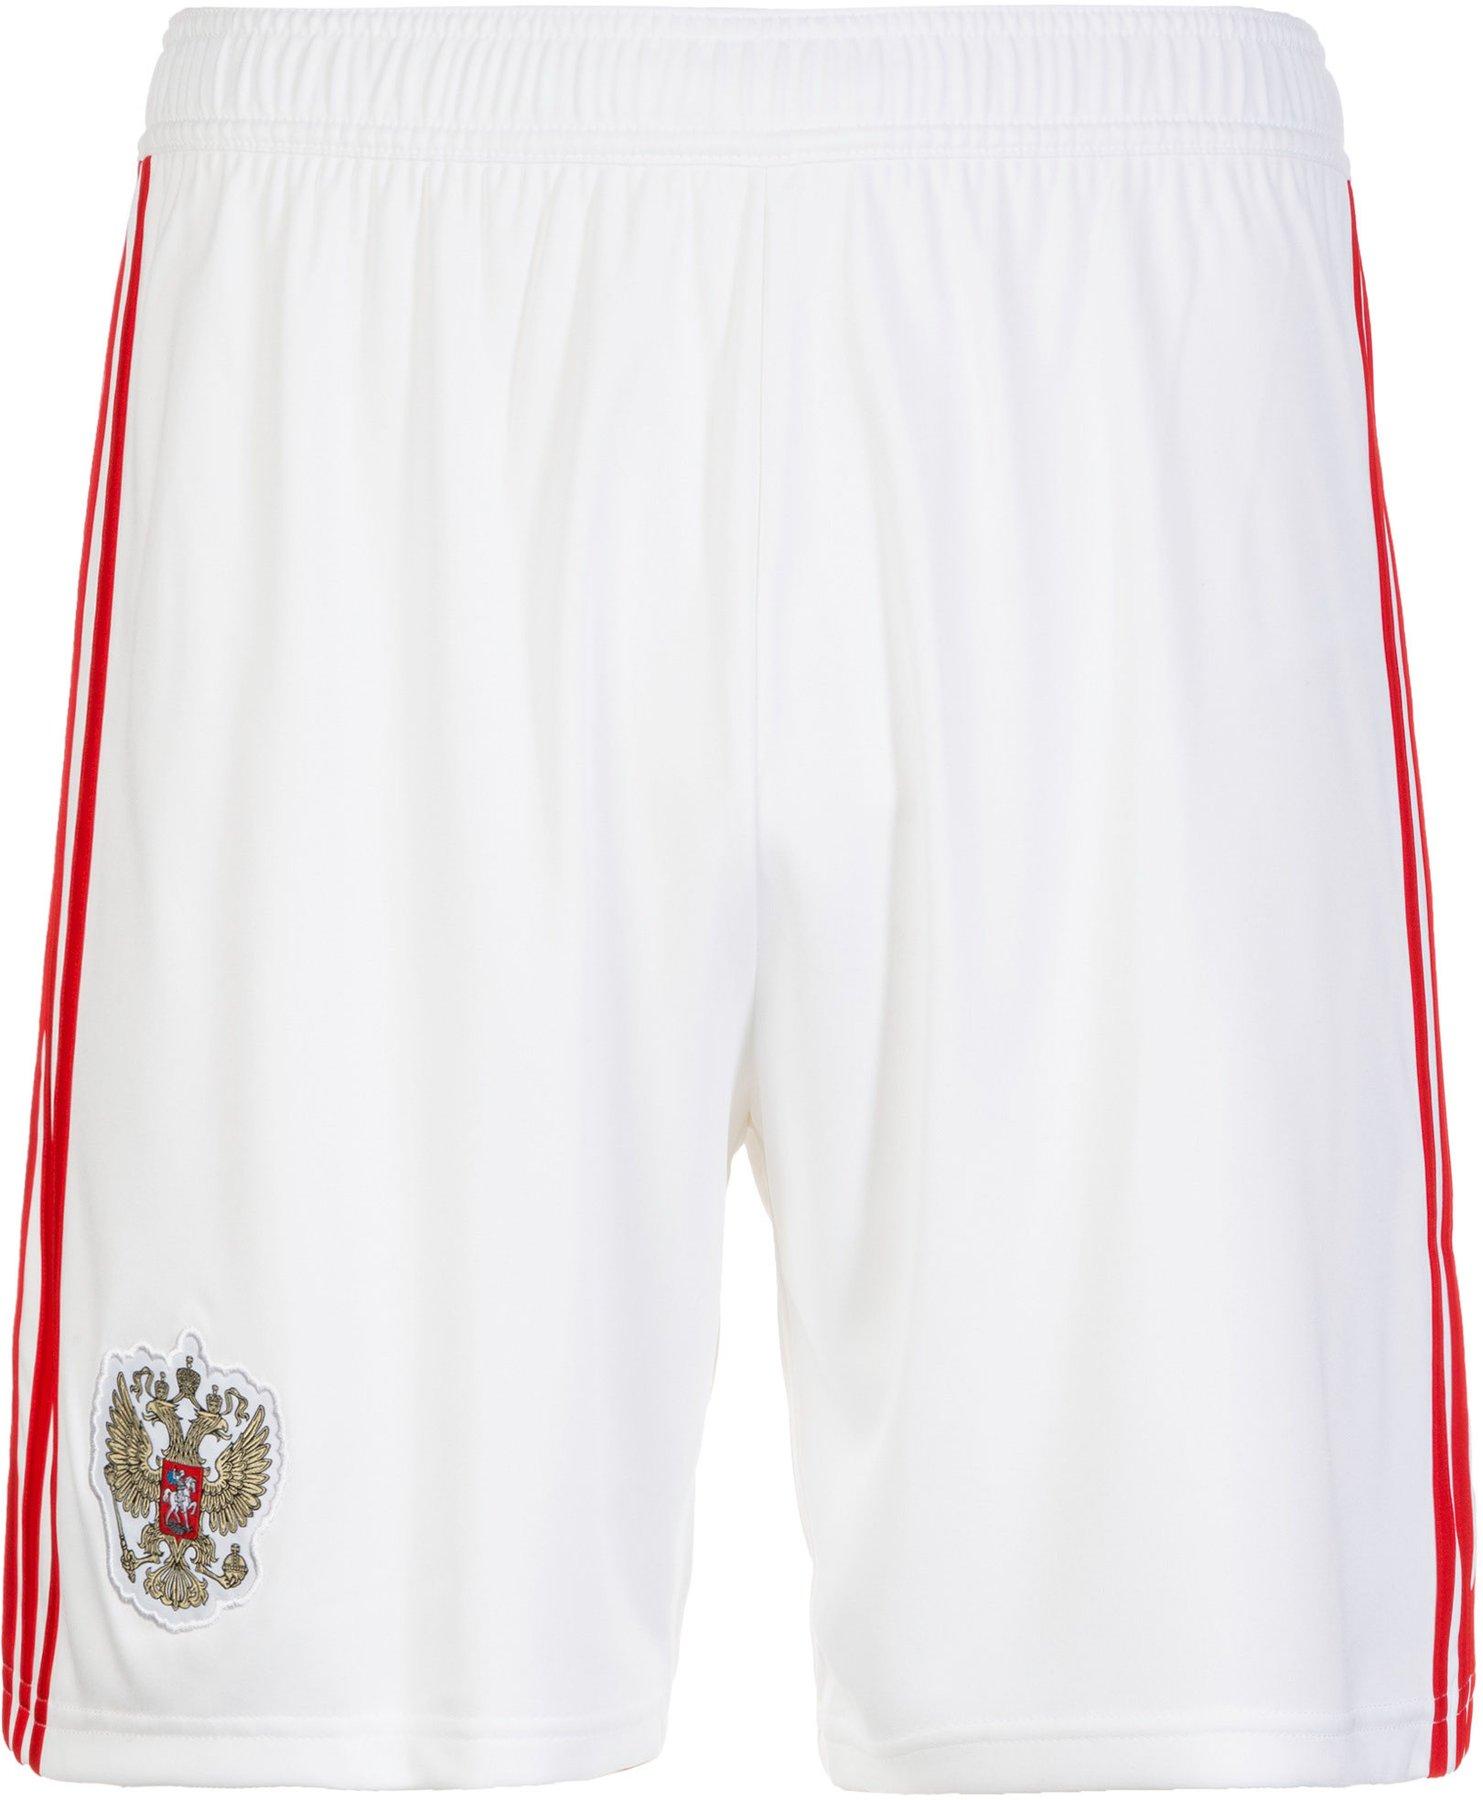 Adidas Russland Shorts